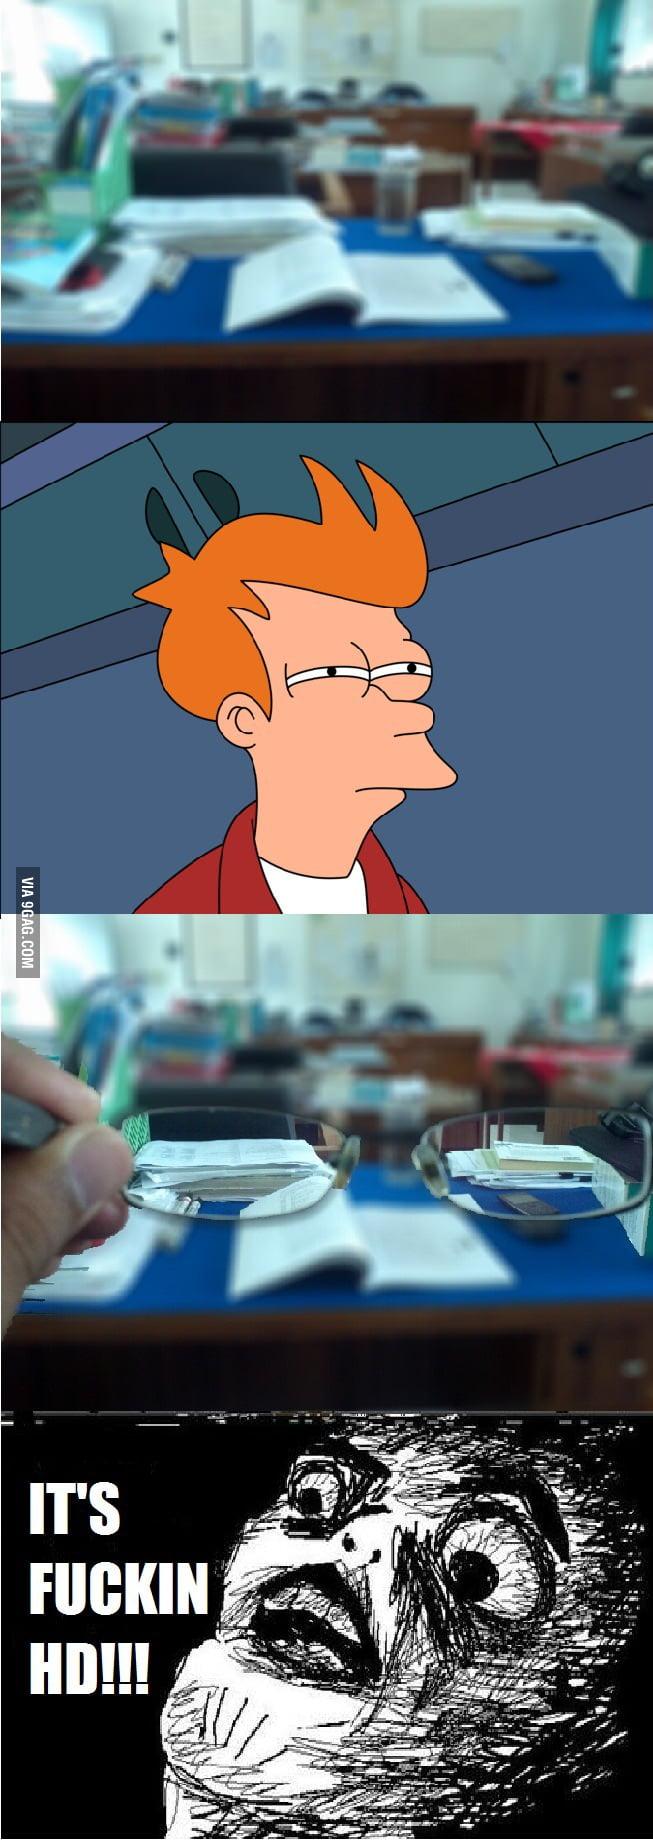 When I get new glasses